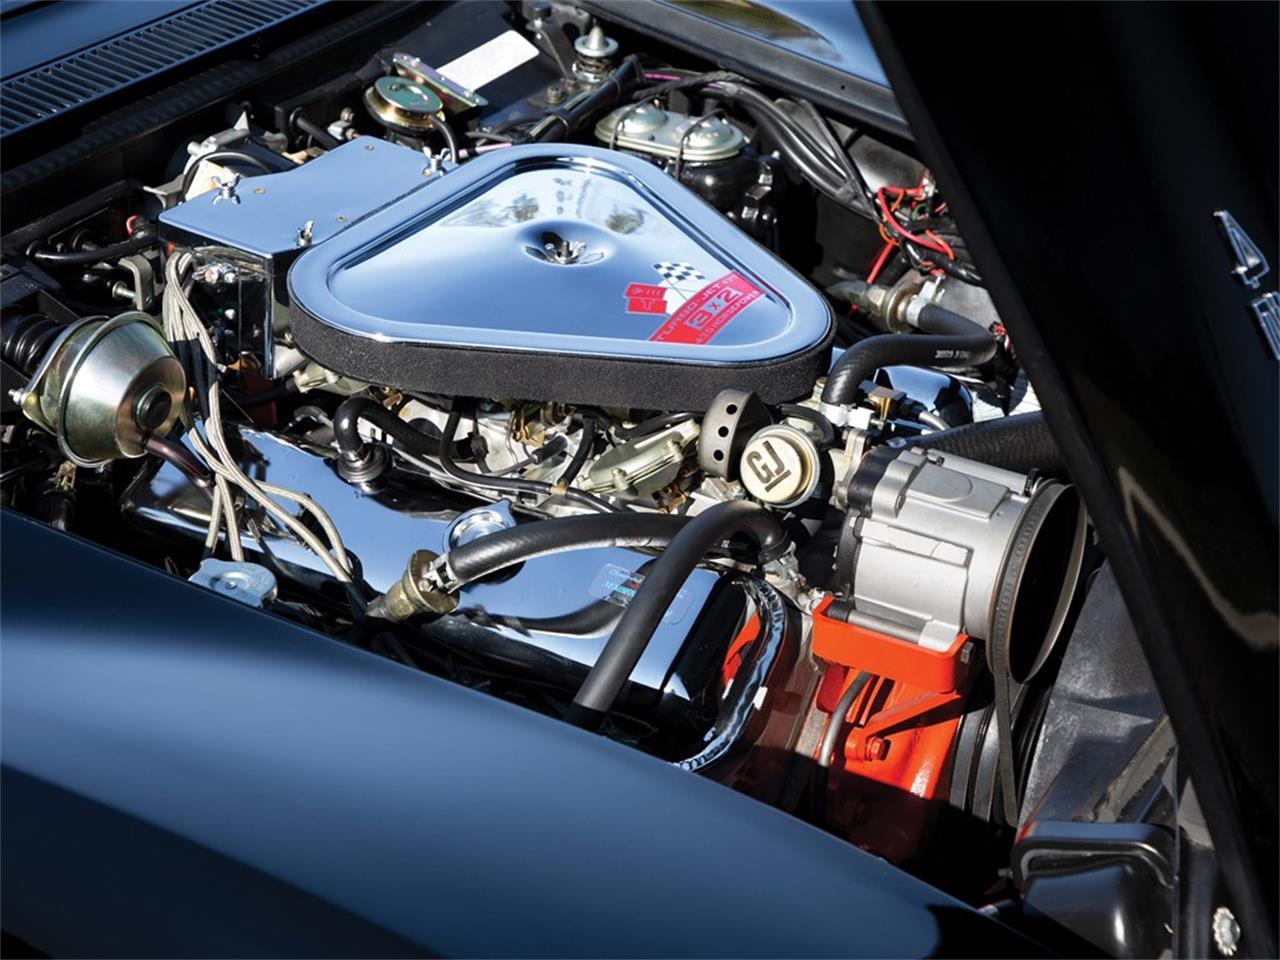 1969 Chevrolet Corvette Stingray (CC-1319940) for sale in Amelia Island, Florida